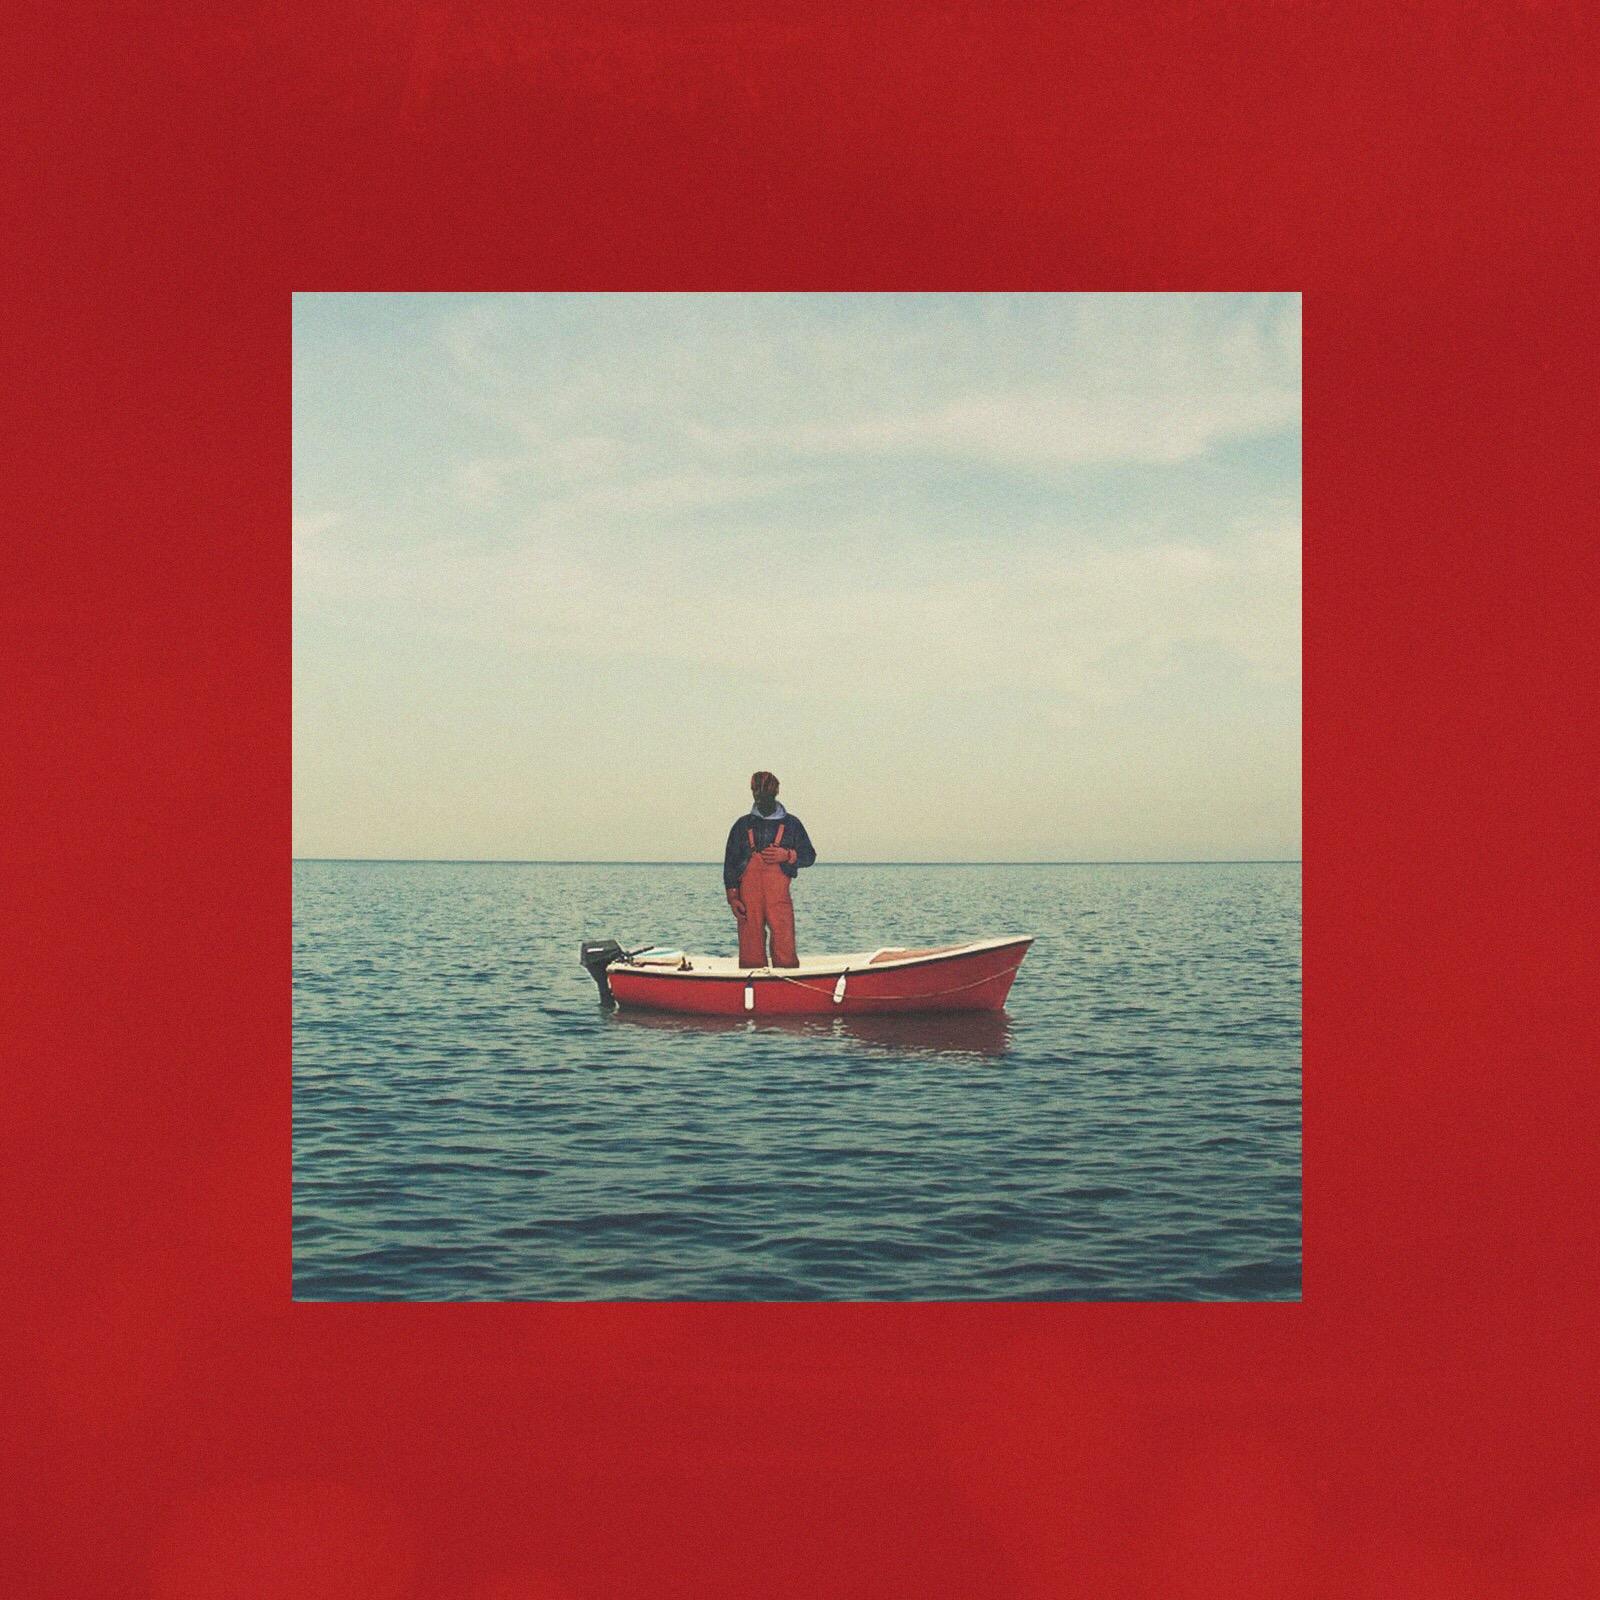 Lil Yachty S Lil Boat Mixtape To Receive Vinyl Release